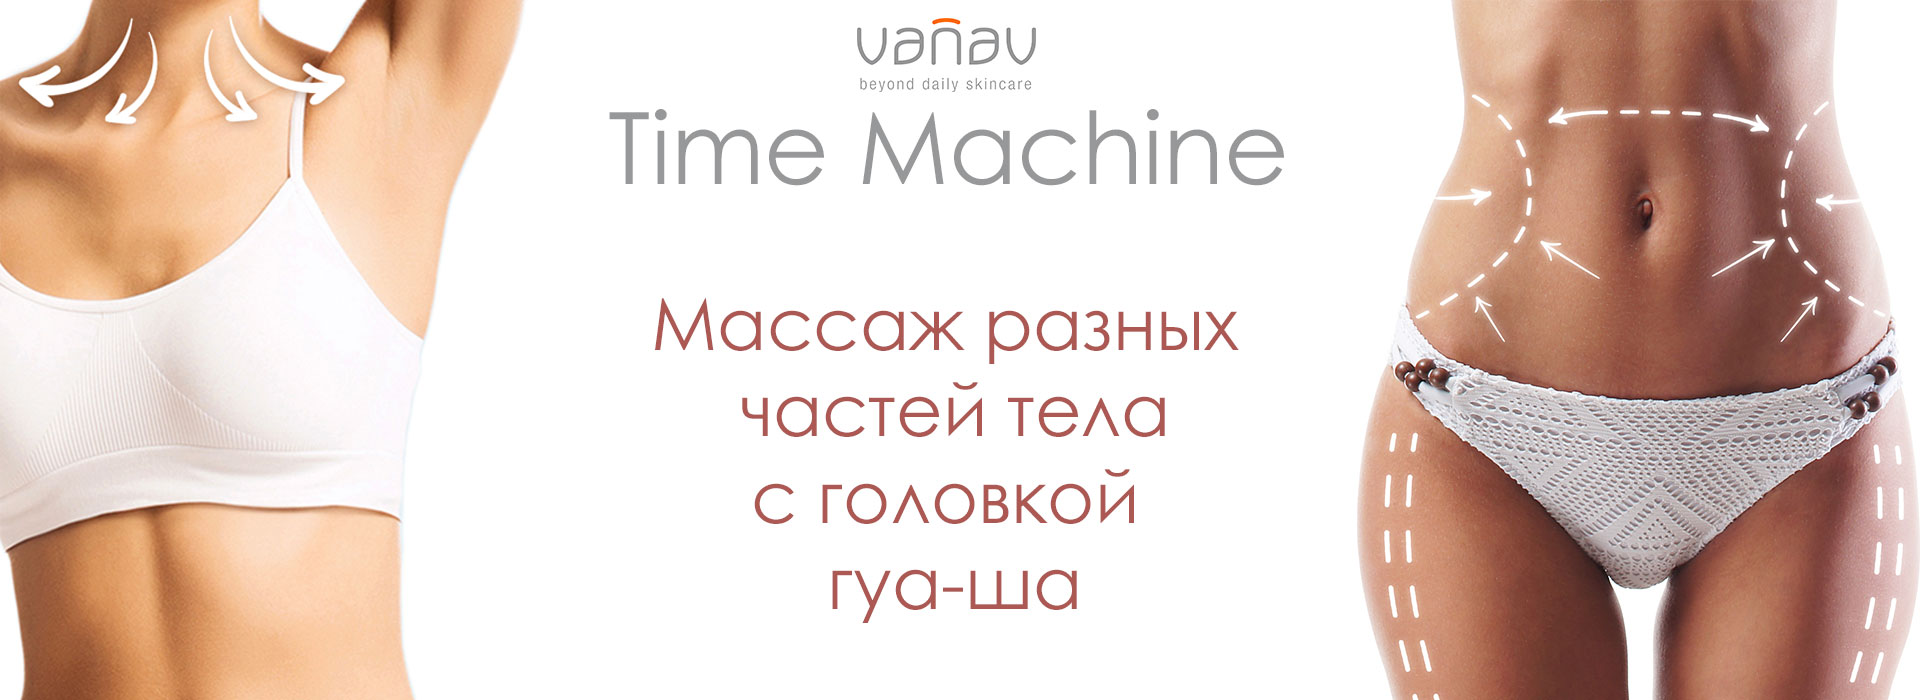 Массаж гуа-ша с помощью VANAV Time Machine